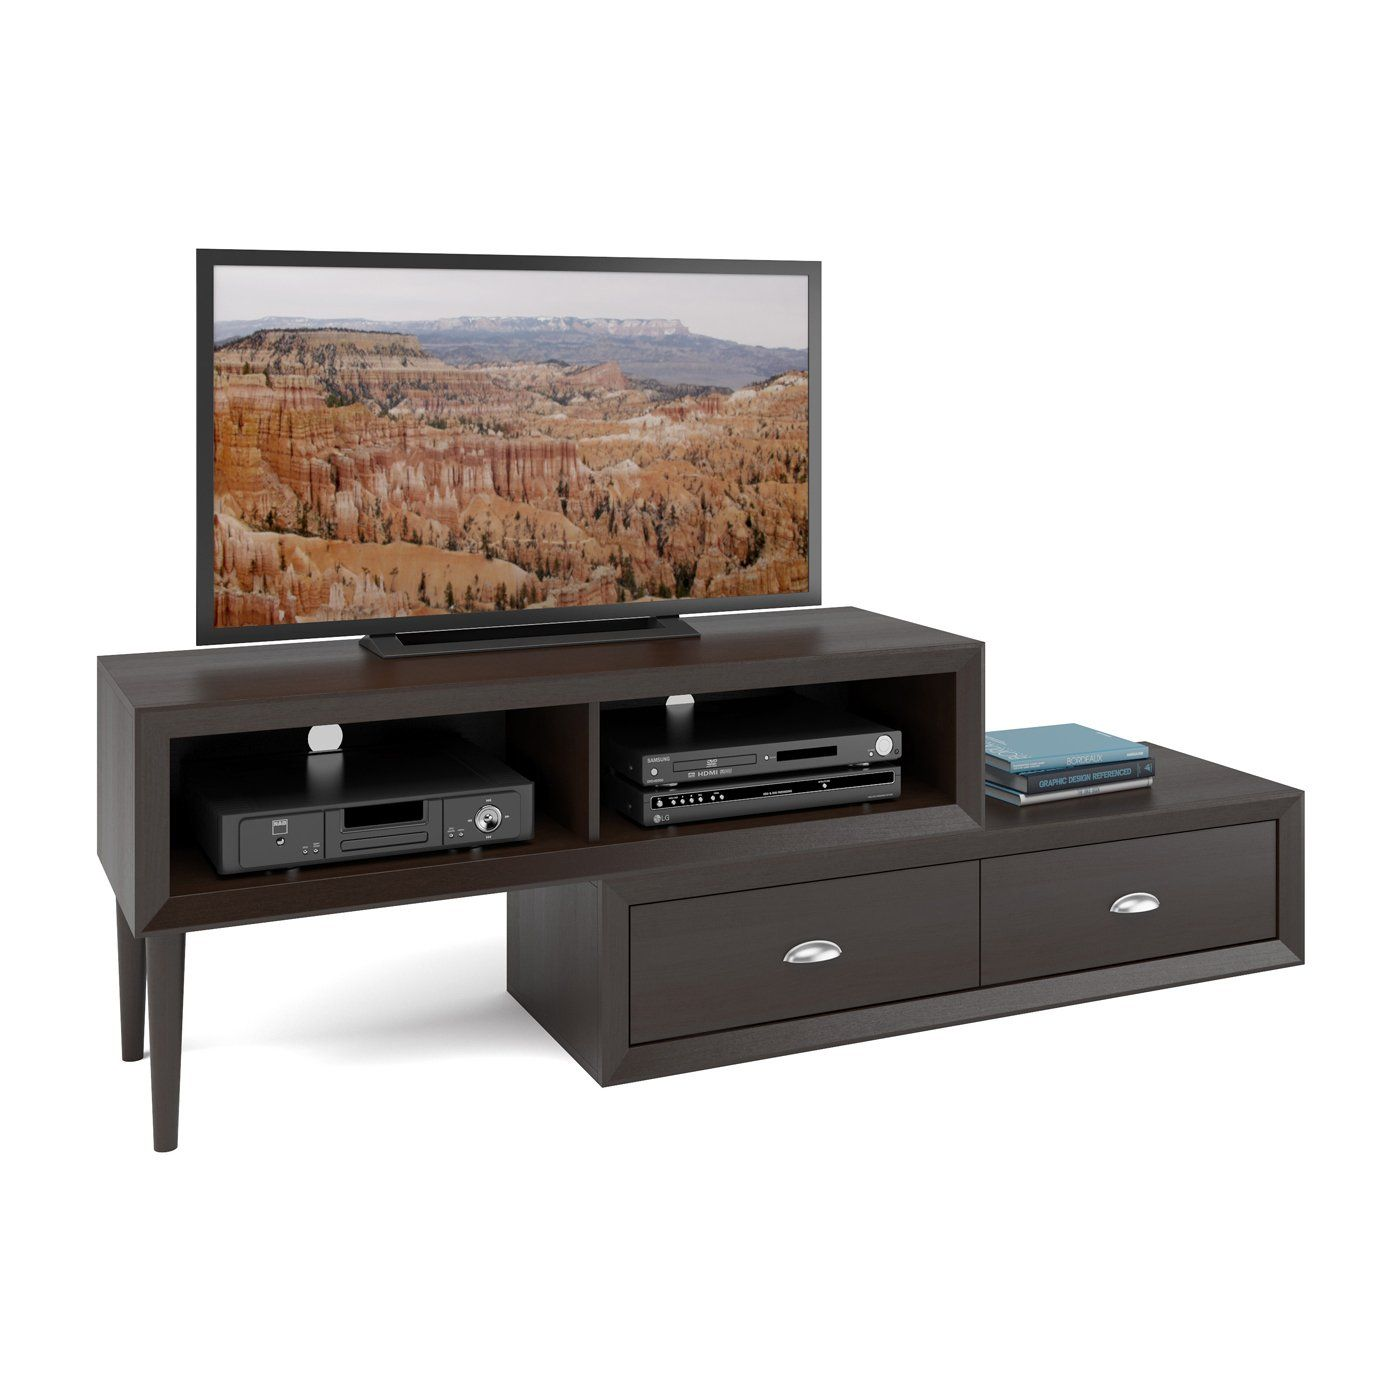 CorLiving TLK883B Lakewood TwoTiered Adjustable TV